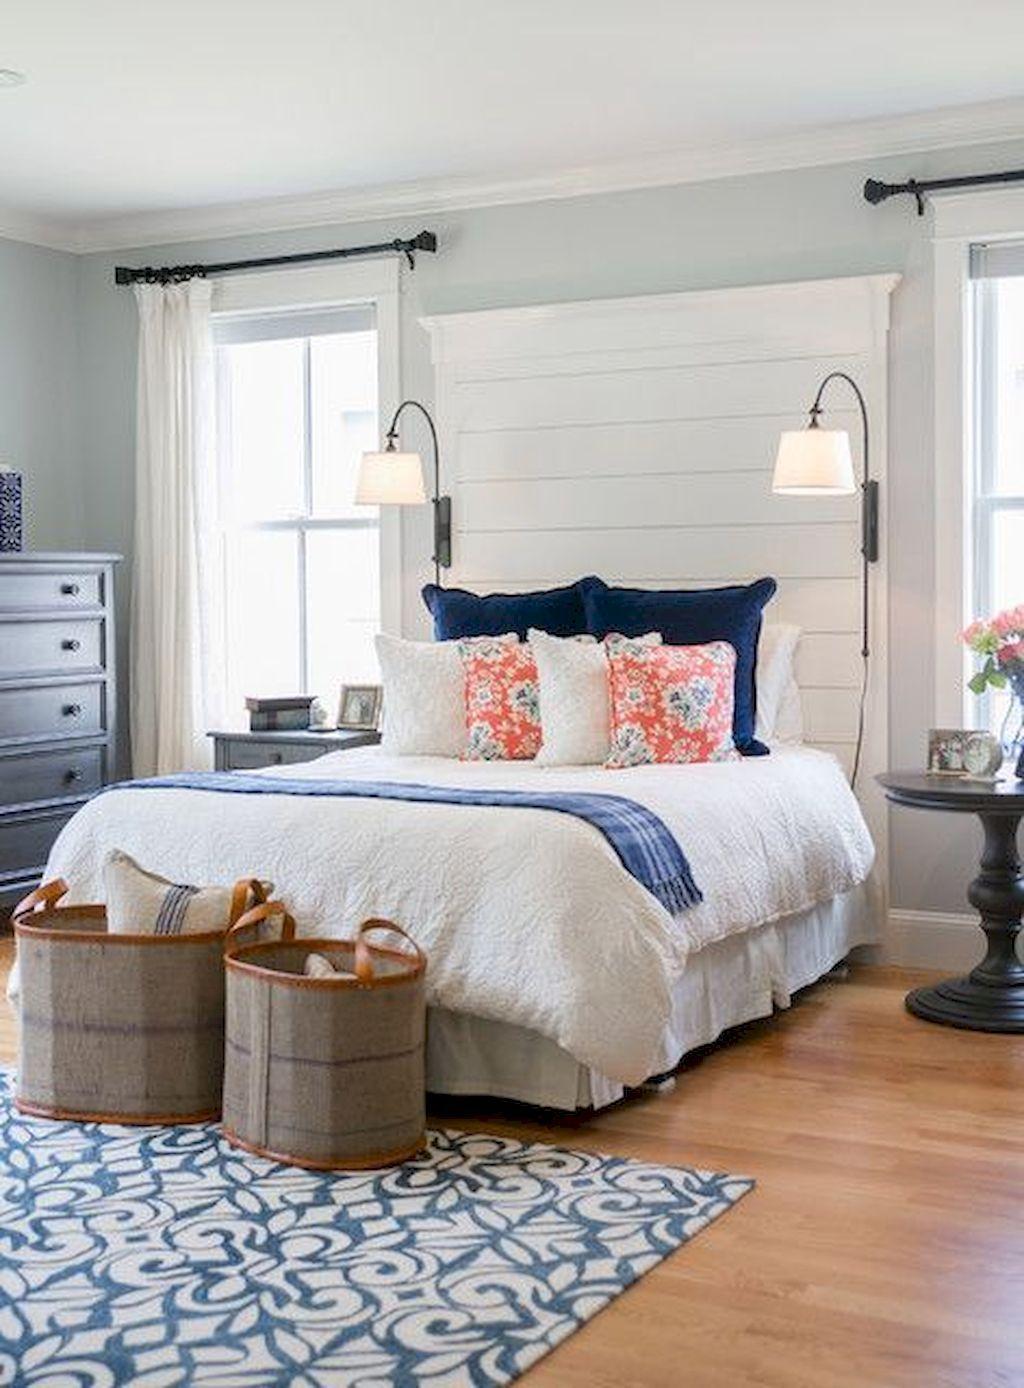 70 Modern Rustic Farmhouse Bedroom Decor Ideas